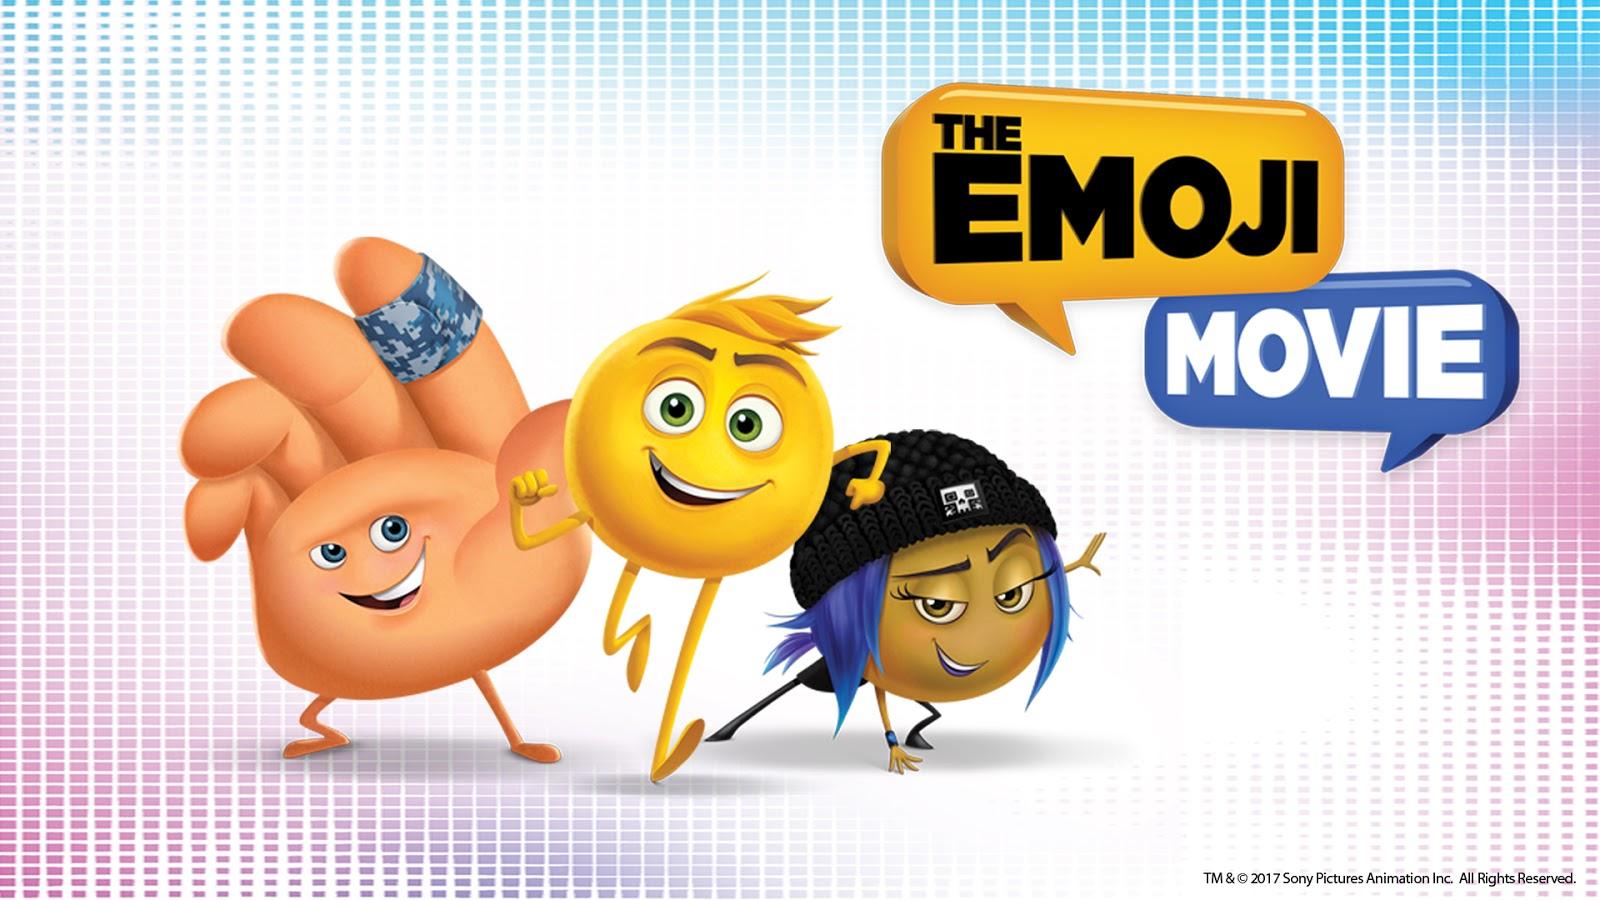 the emoji movie full movie online free hd